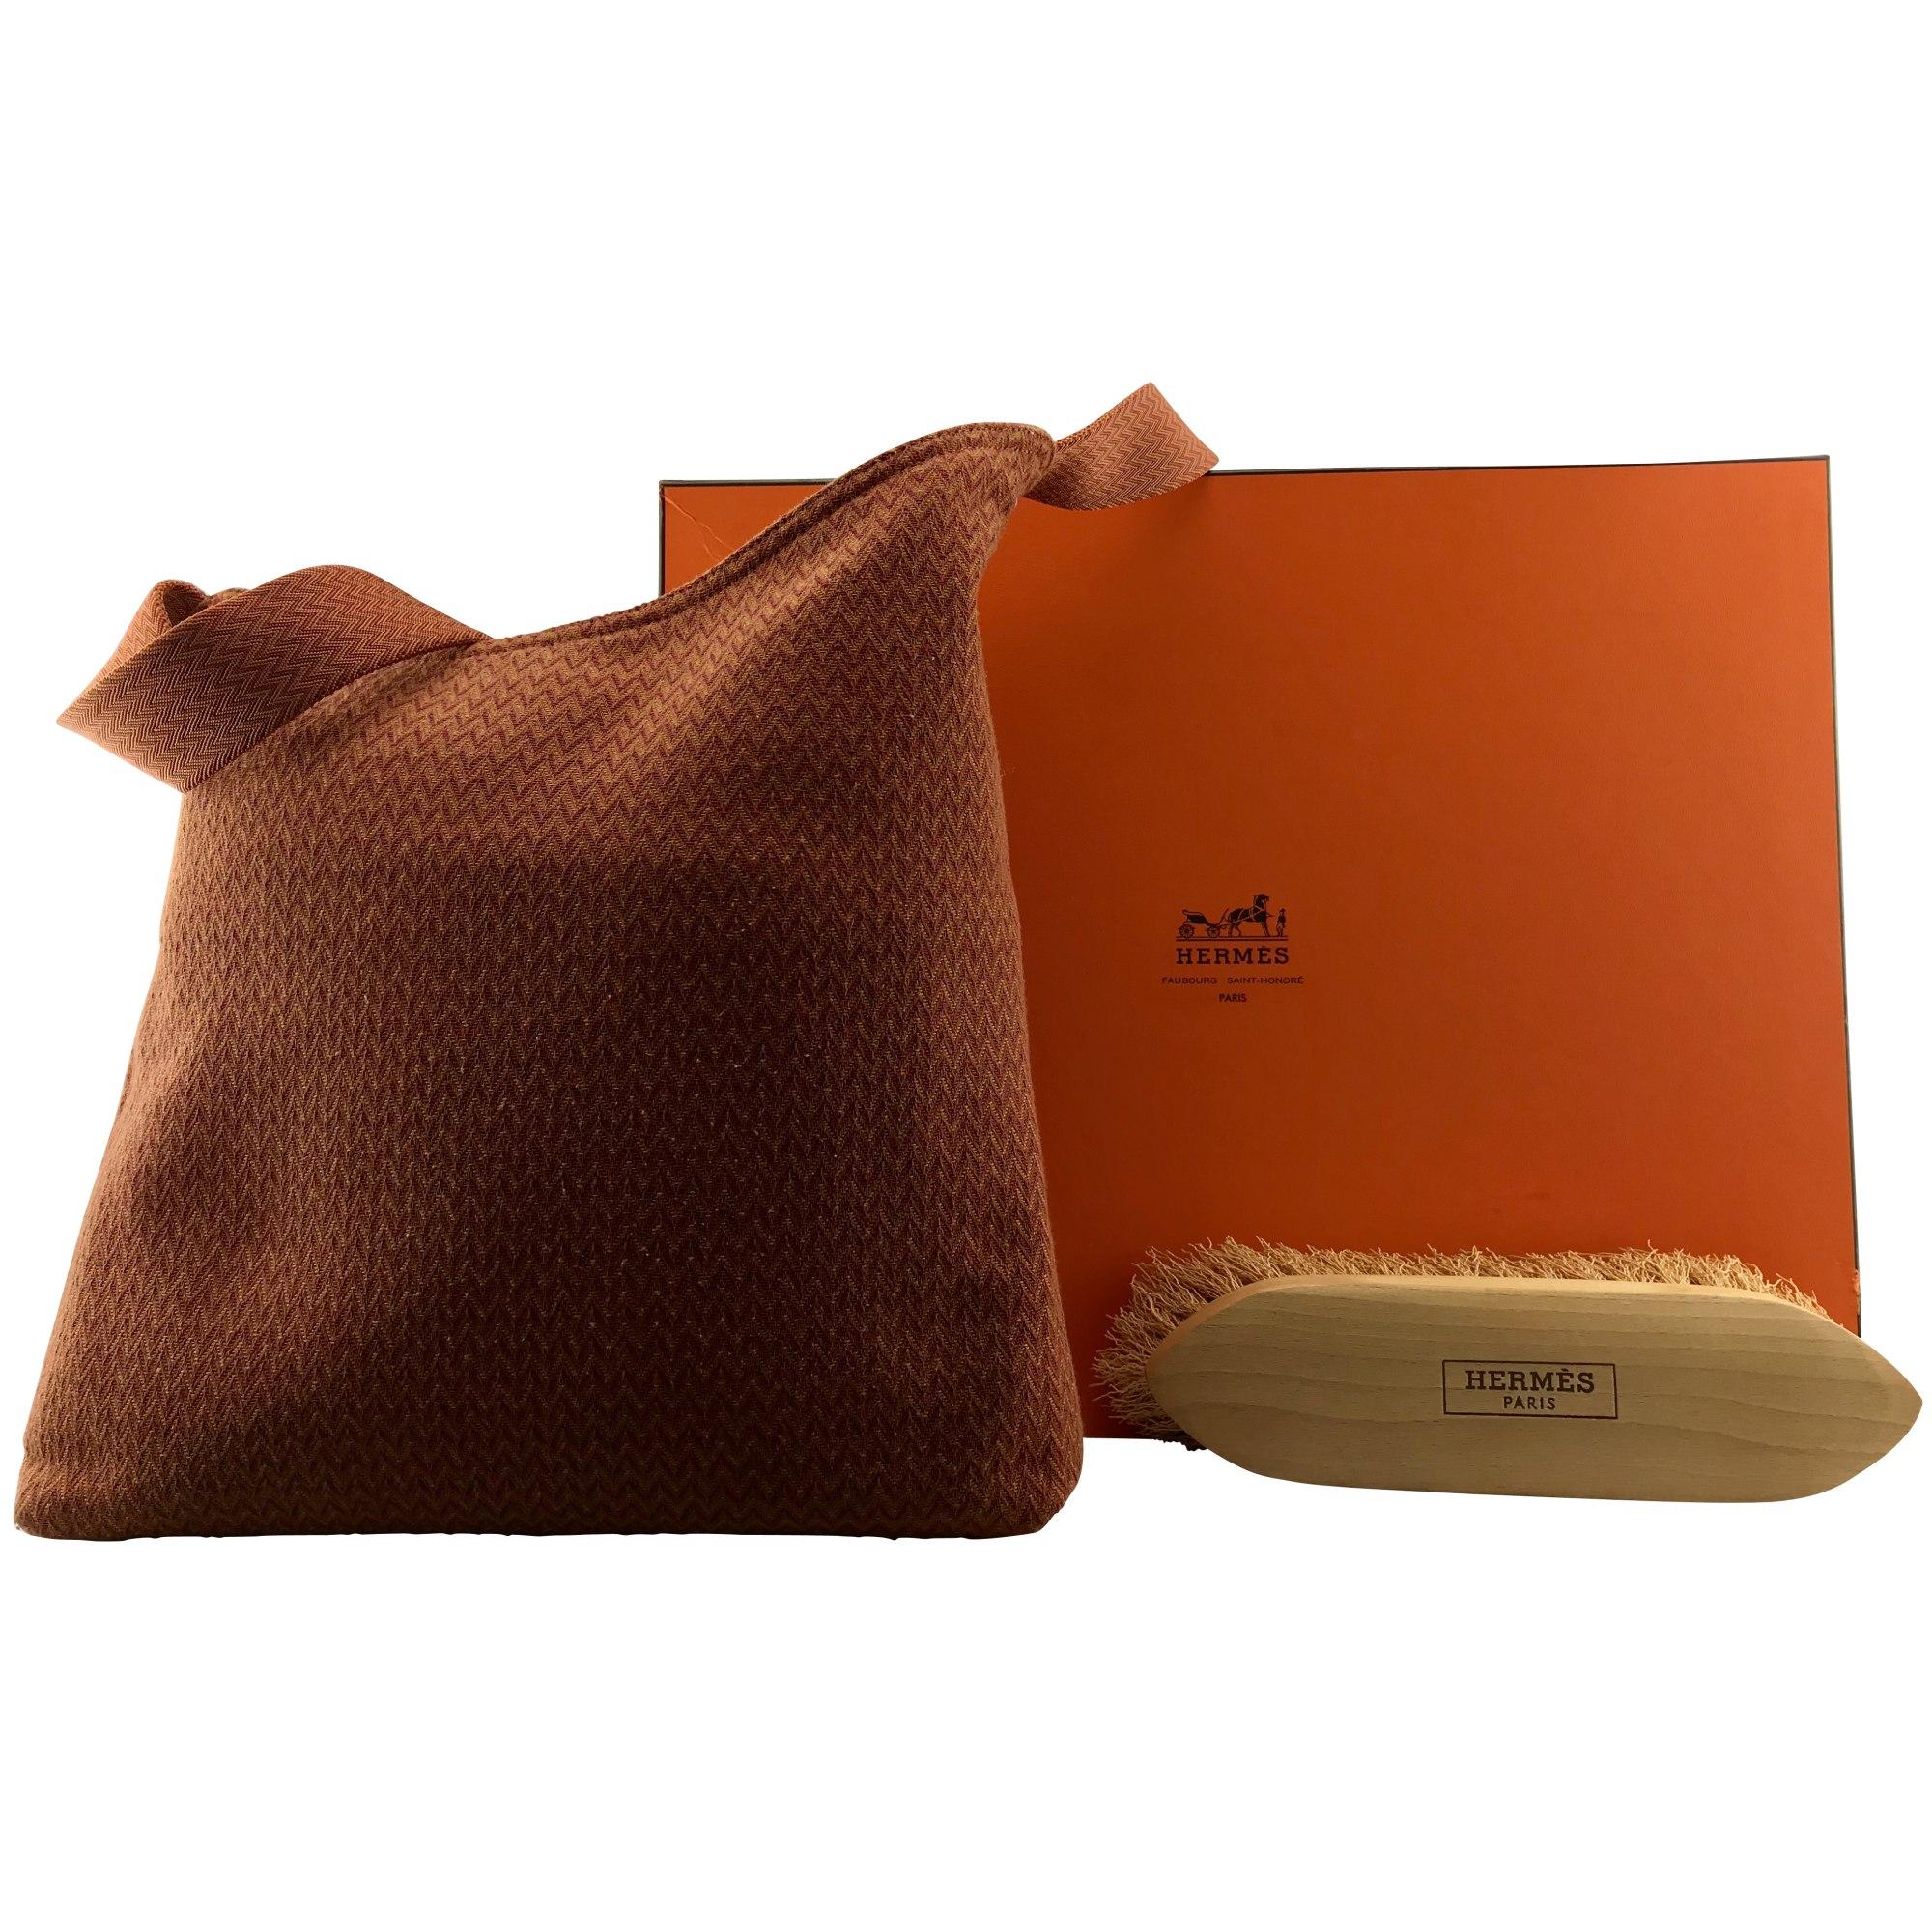 Non-Leather Handbag HERMÈS Orange